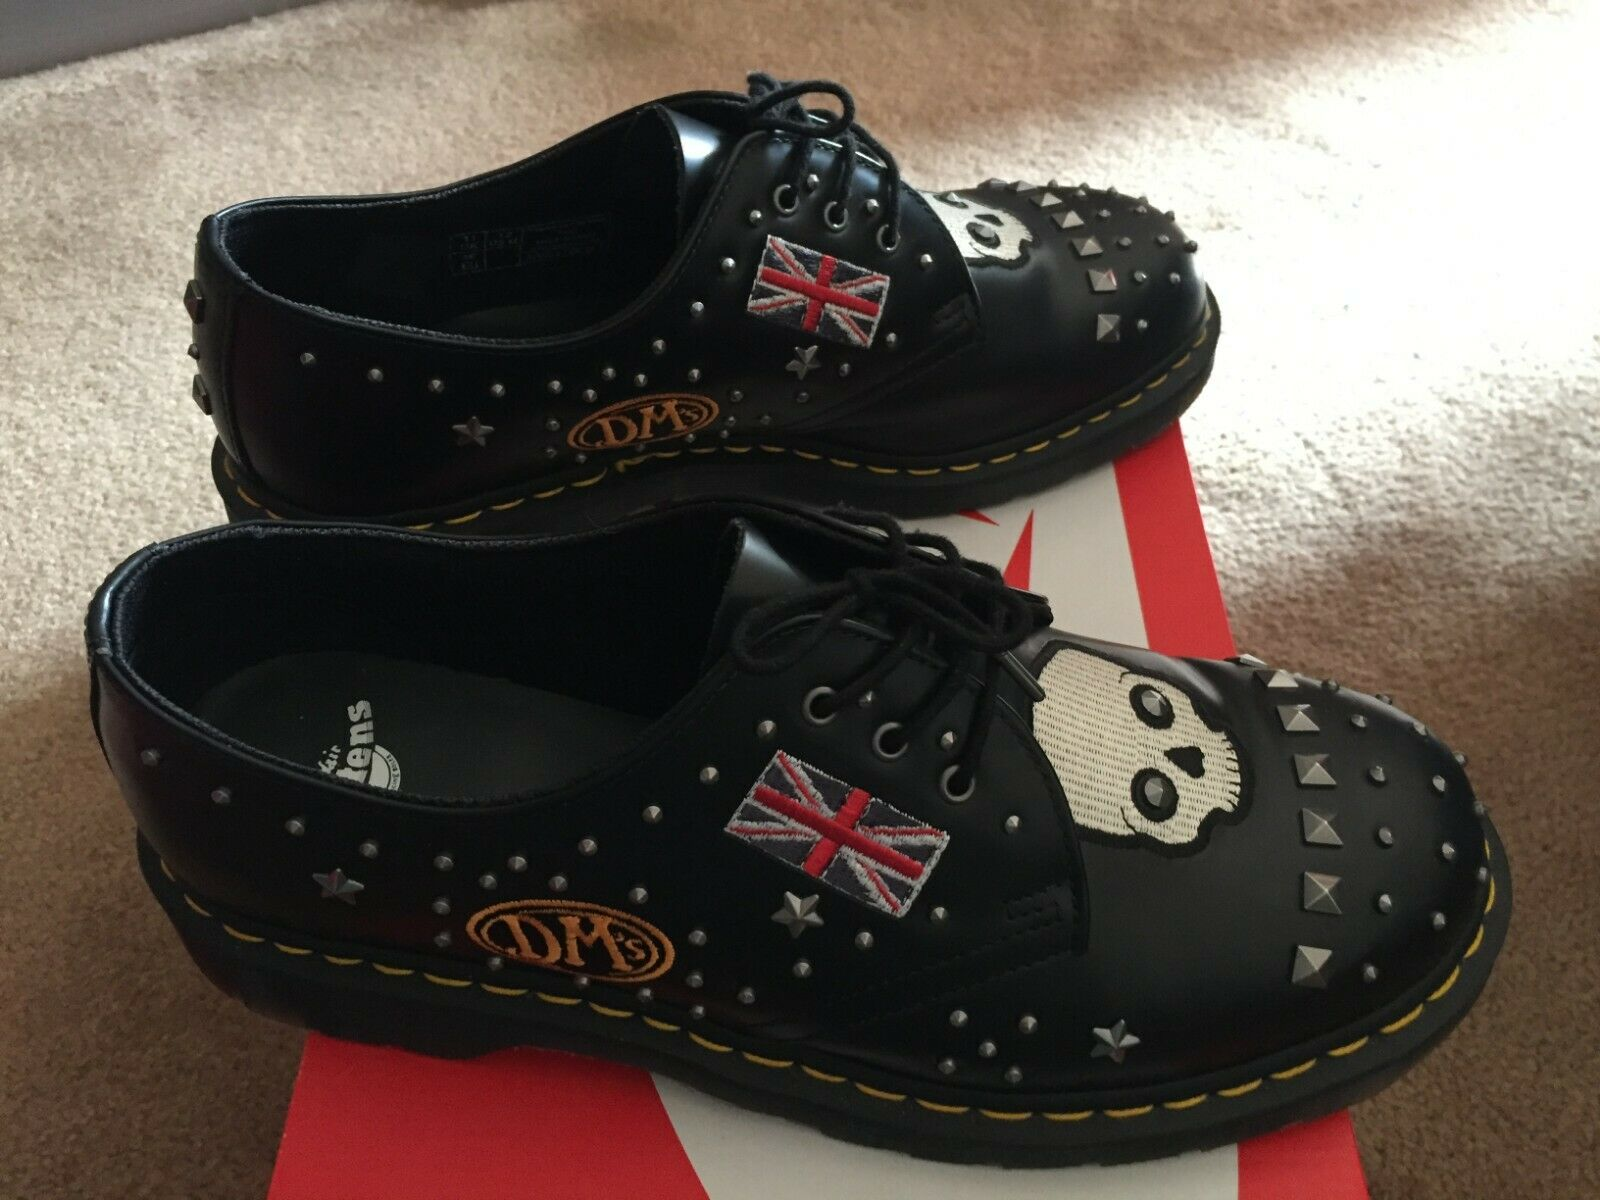 Dr Martens Unisex 1461 Black Rock and Roll Rockabilly Badges Leather Punk shoes